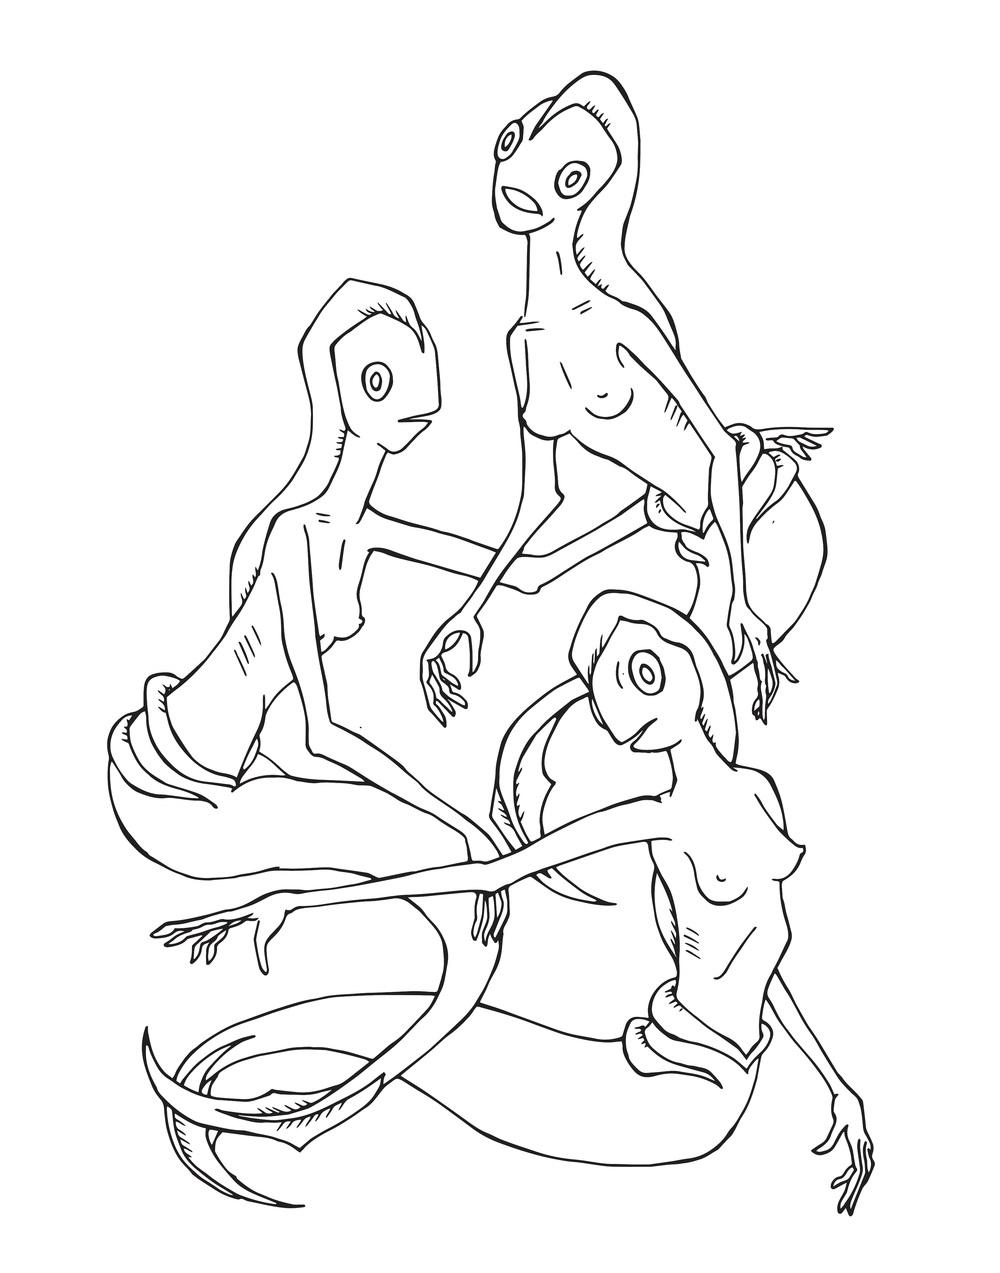 Drawing by Emma Halaburka